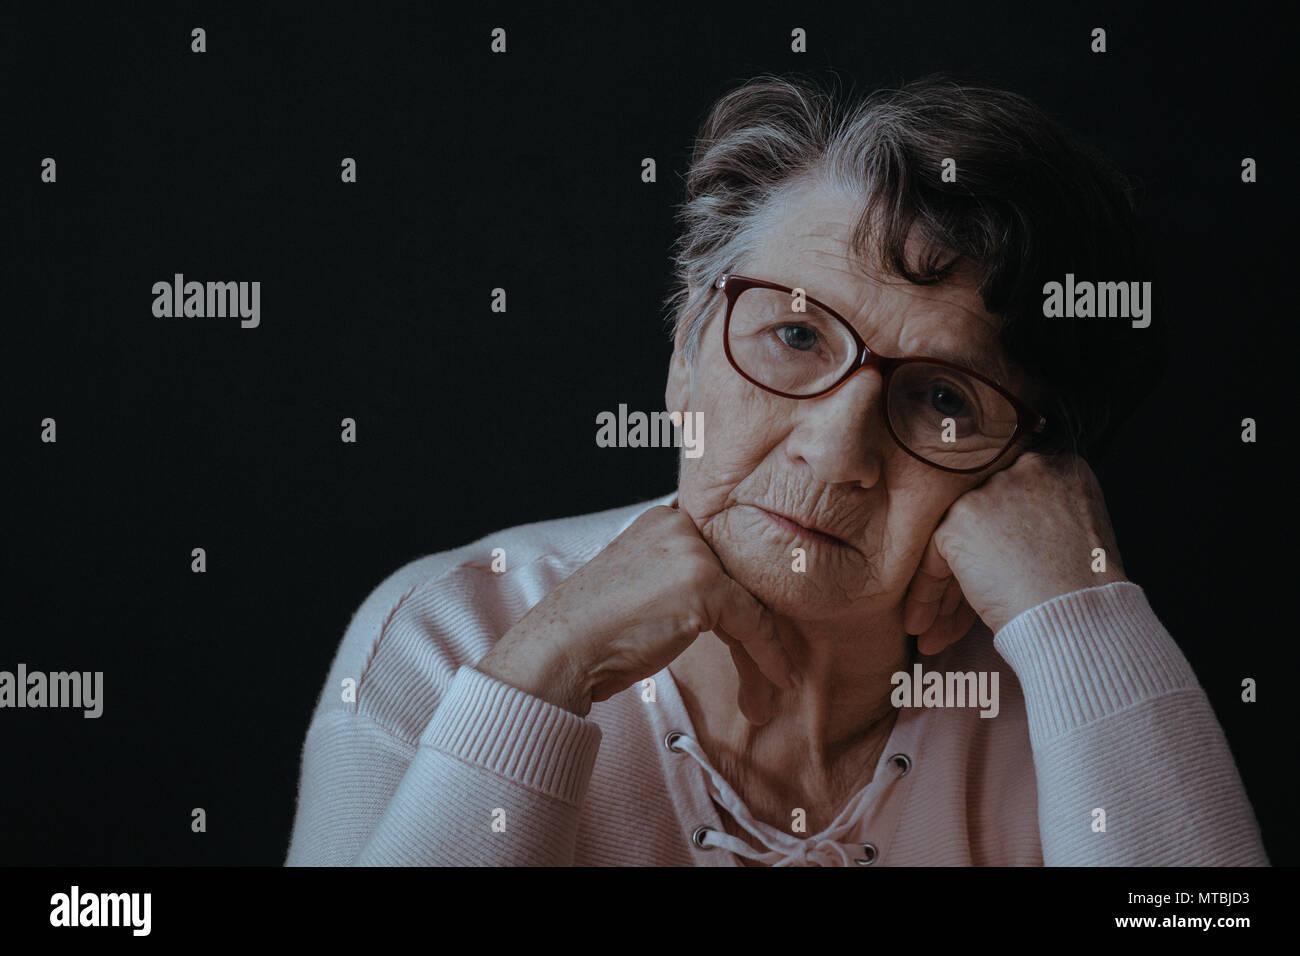 Sad, old woman wearing eyeglasses, black background - Stock Image